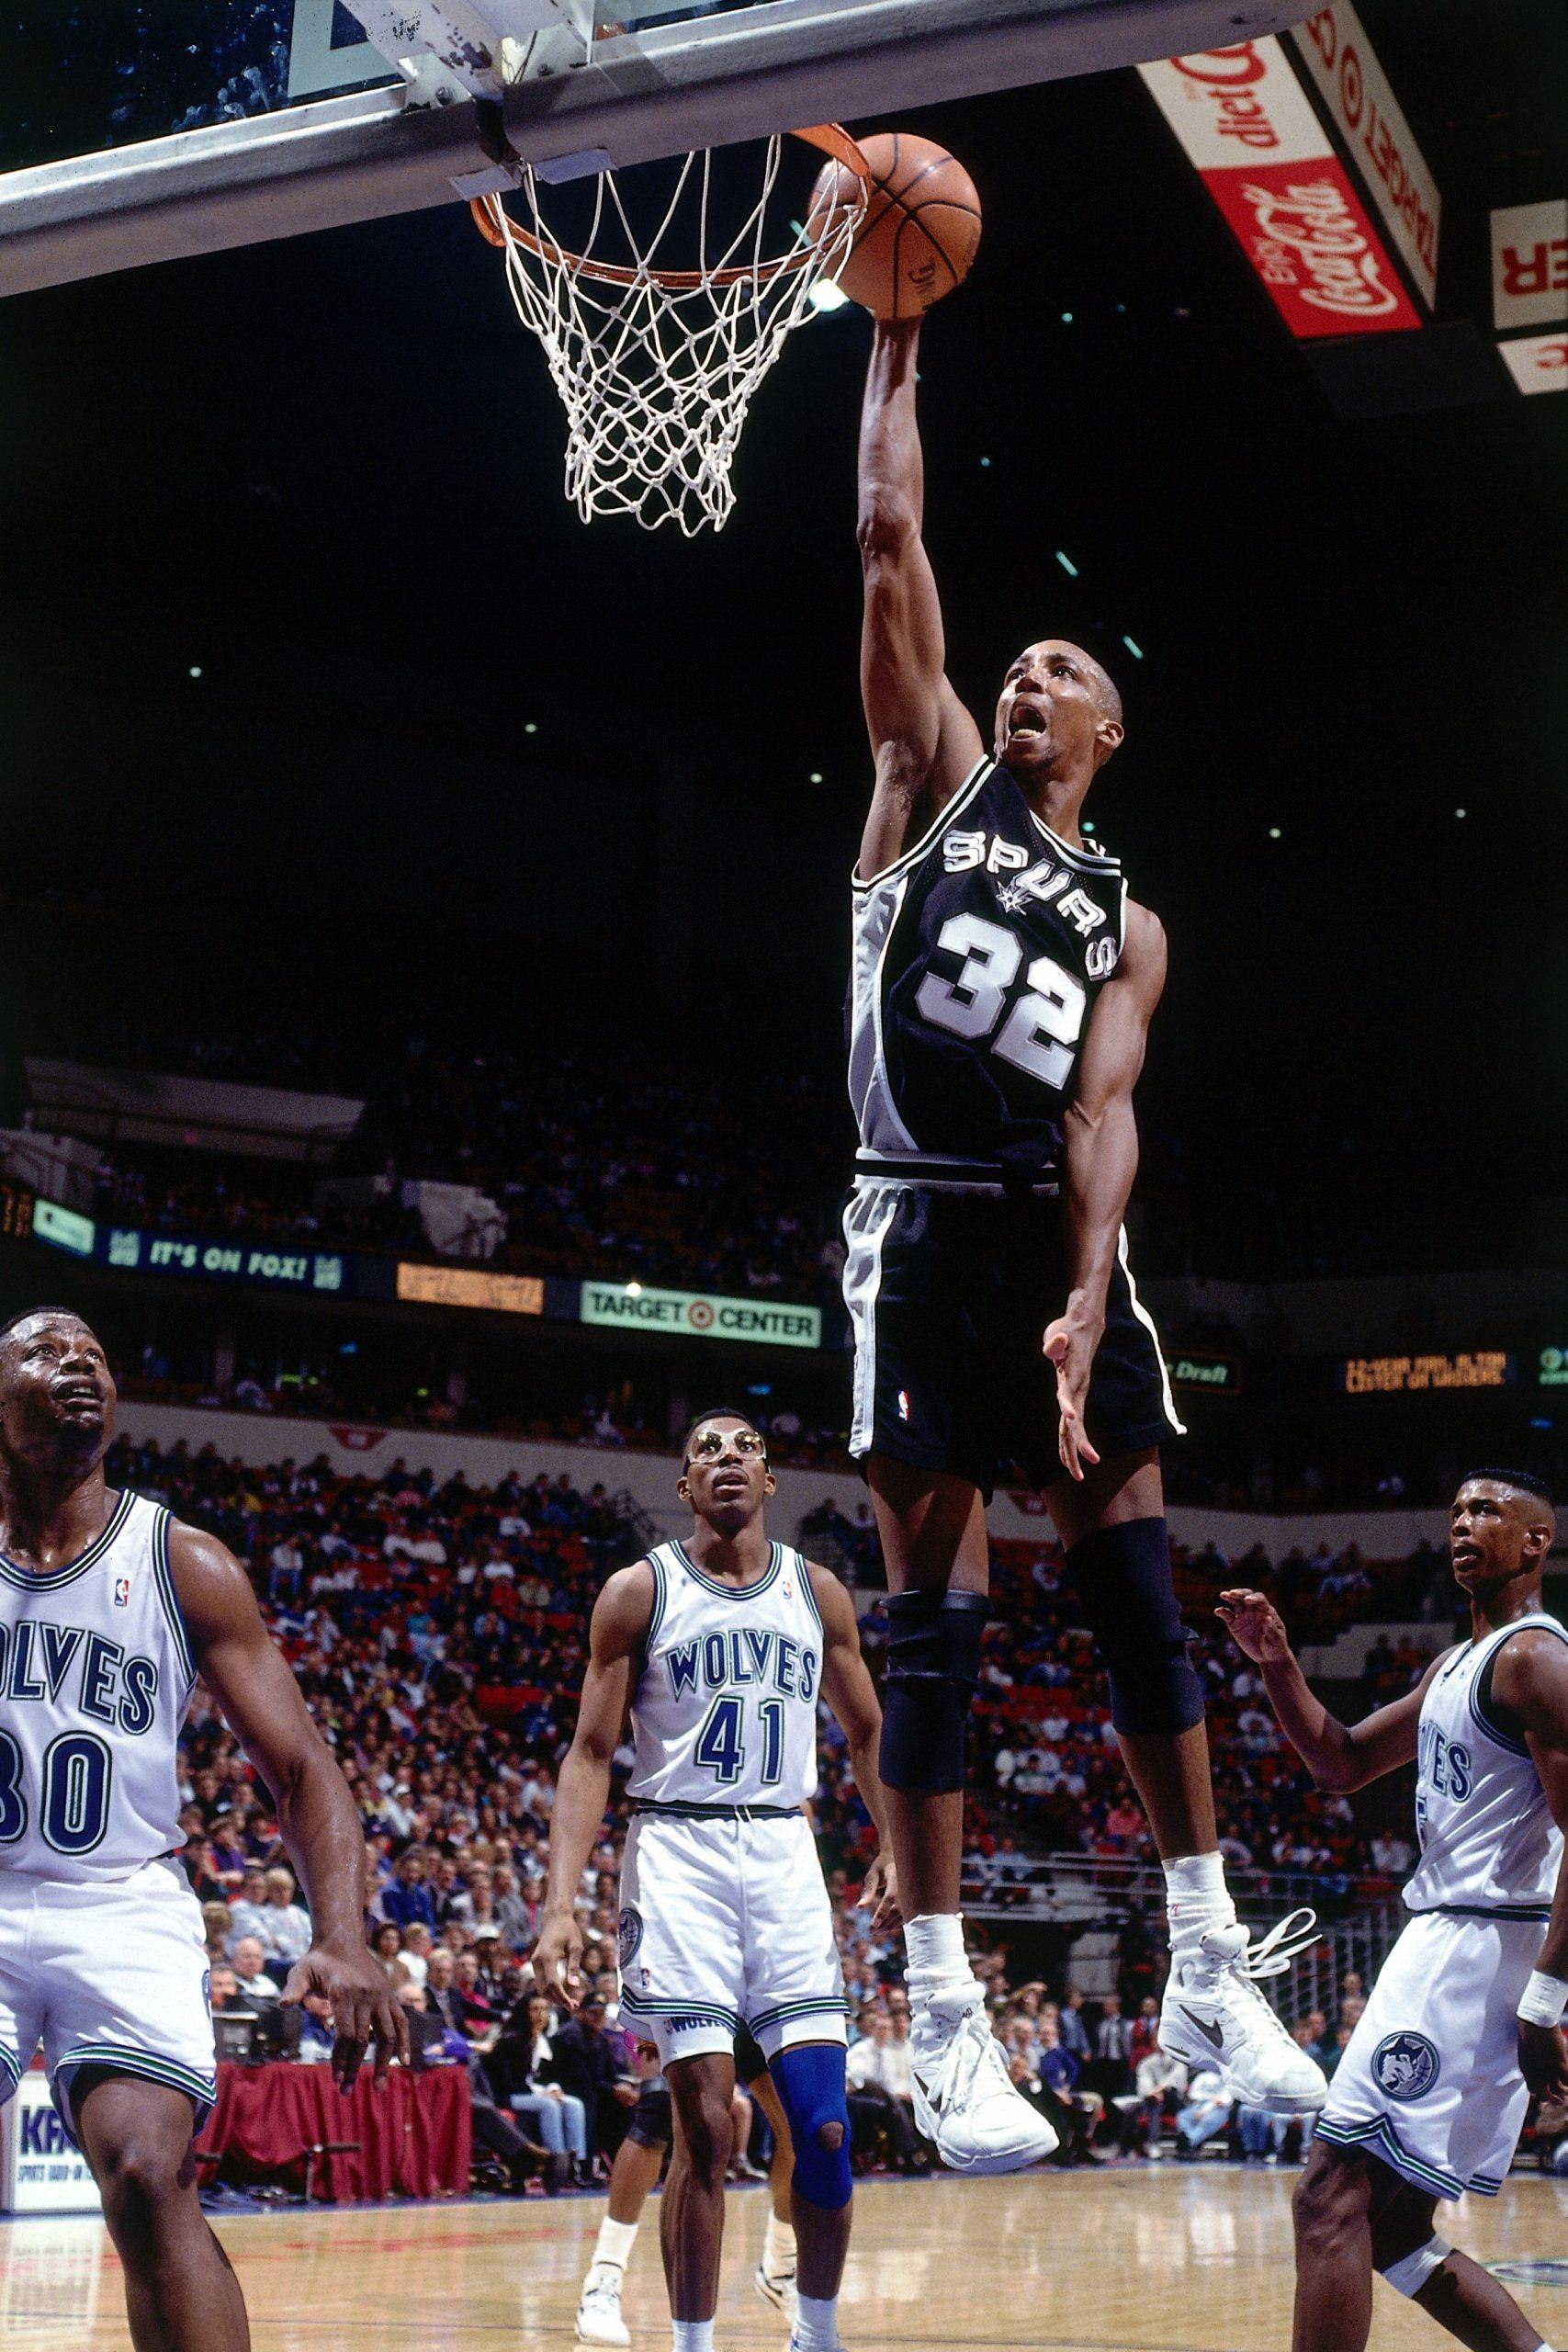 MINNEAPOLIS - 1993: Sean Elliott, #32, of the San Antonio Spurs dunks against Minnesota Timberwolves at the Target Center during a 1993 season NBA game in Minneapolis, Minnesota. Photo courtesy of San Antonio Spurs.